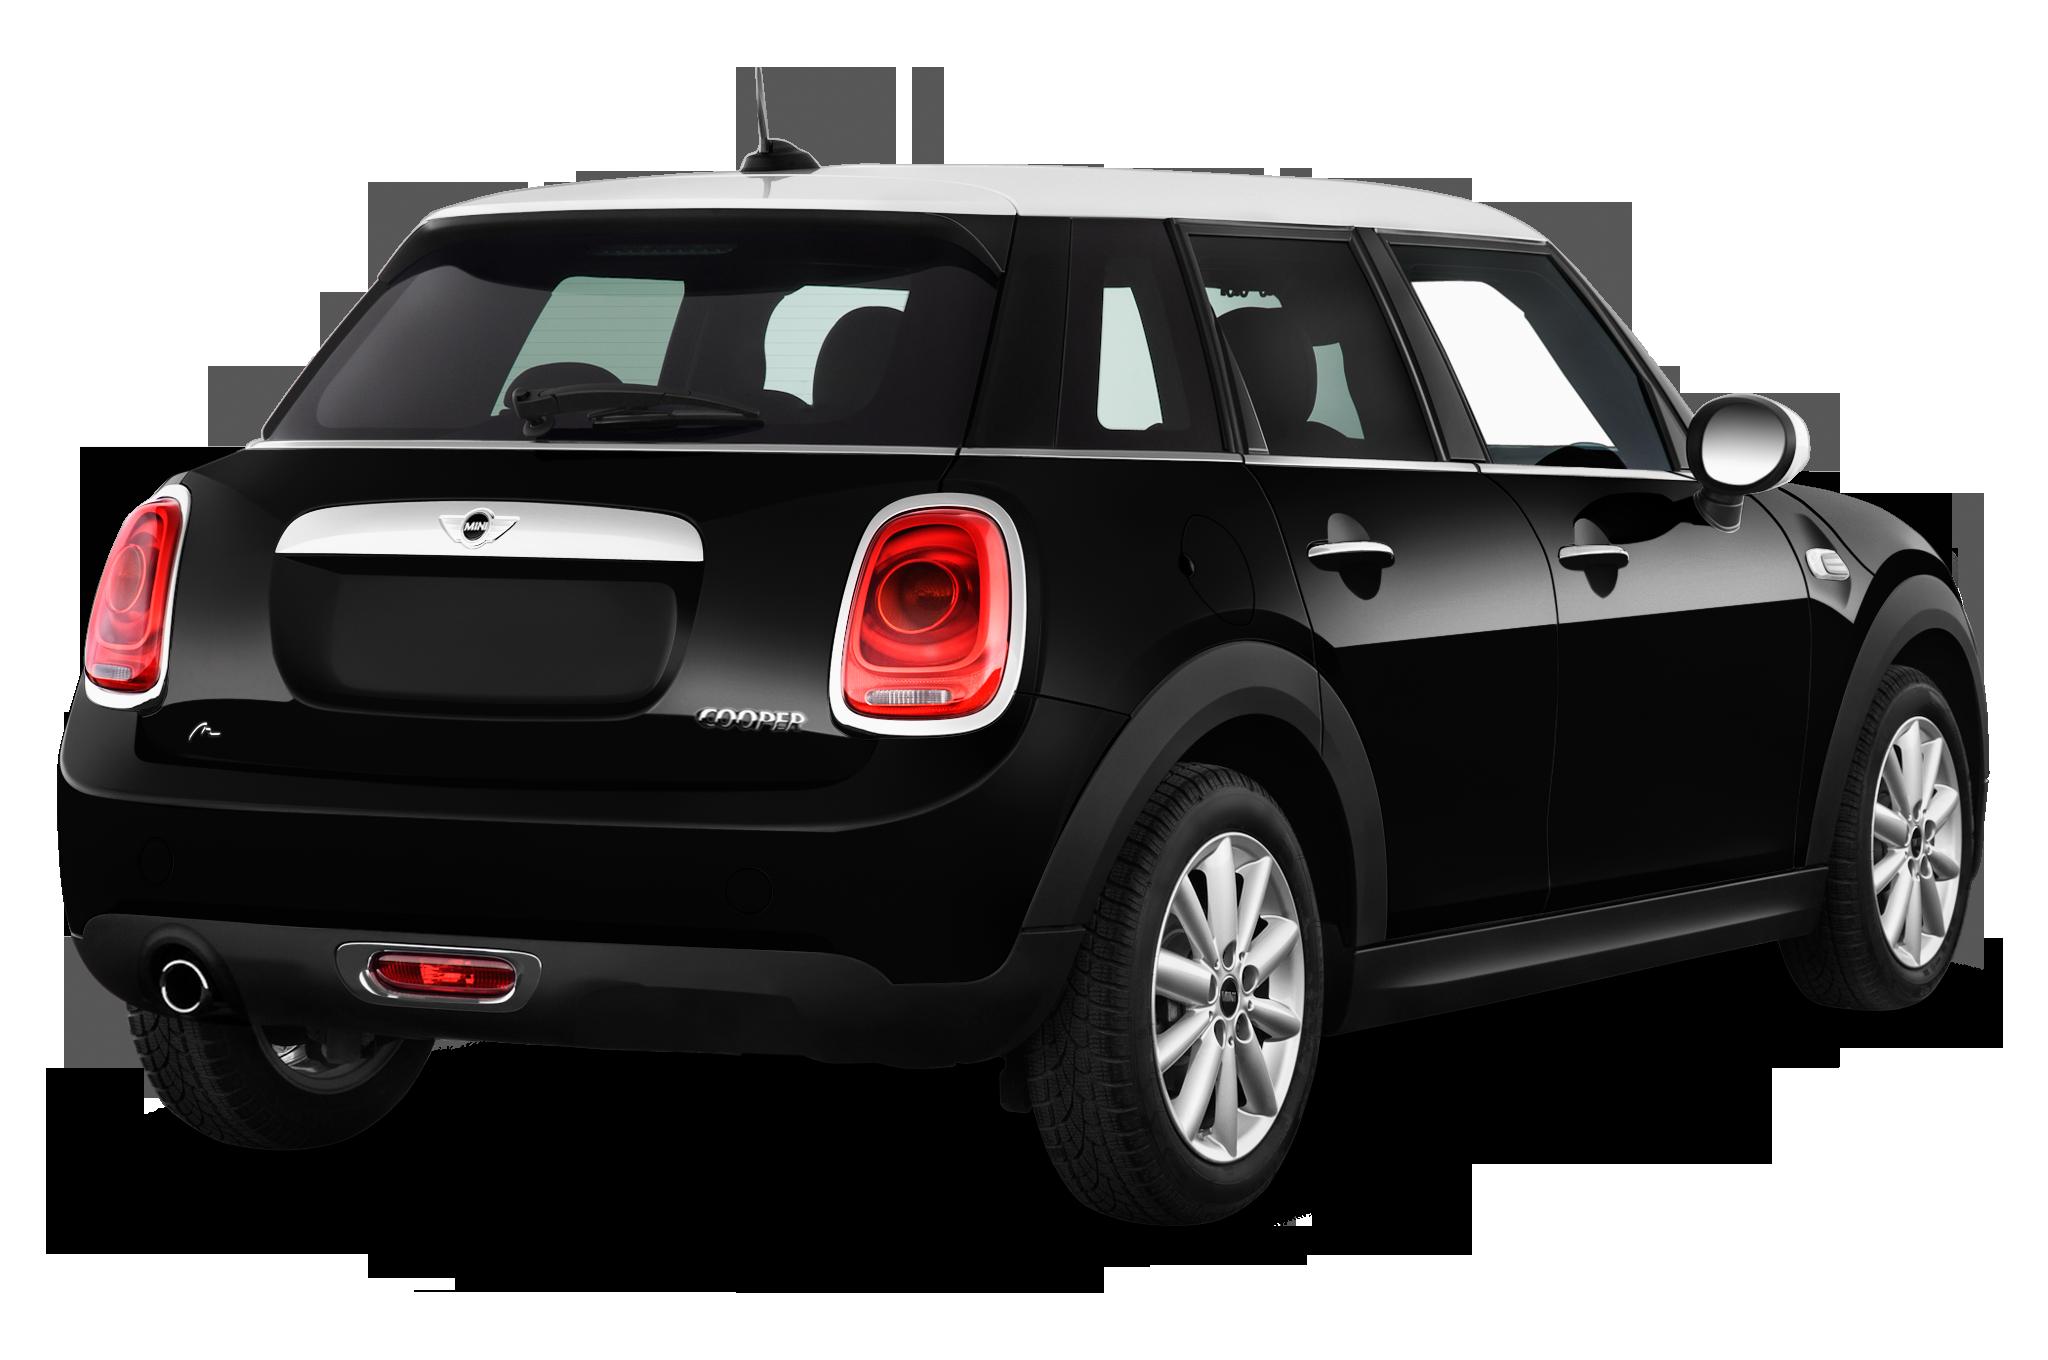 Mini Cooper Lease >> MINI Hatchback | Vehicle Review | Arval UK Ltd